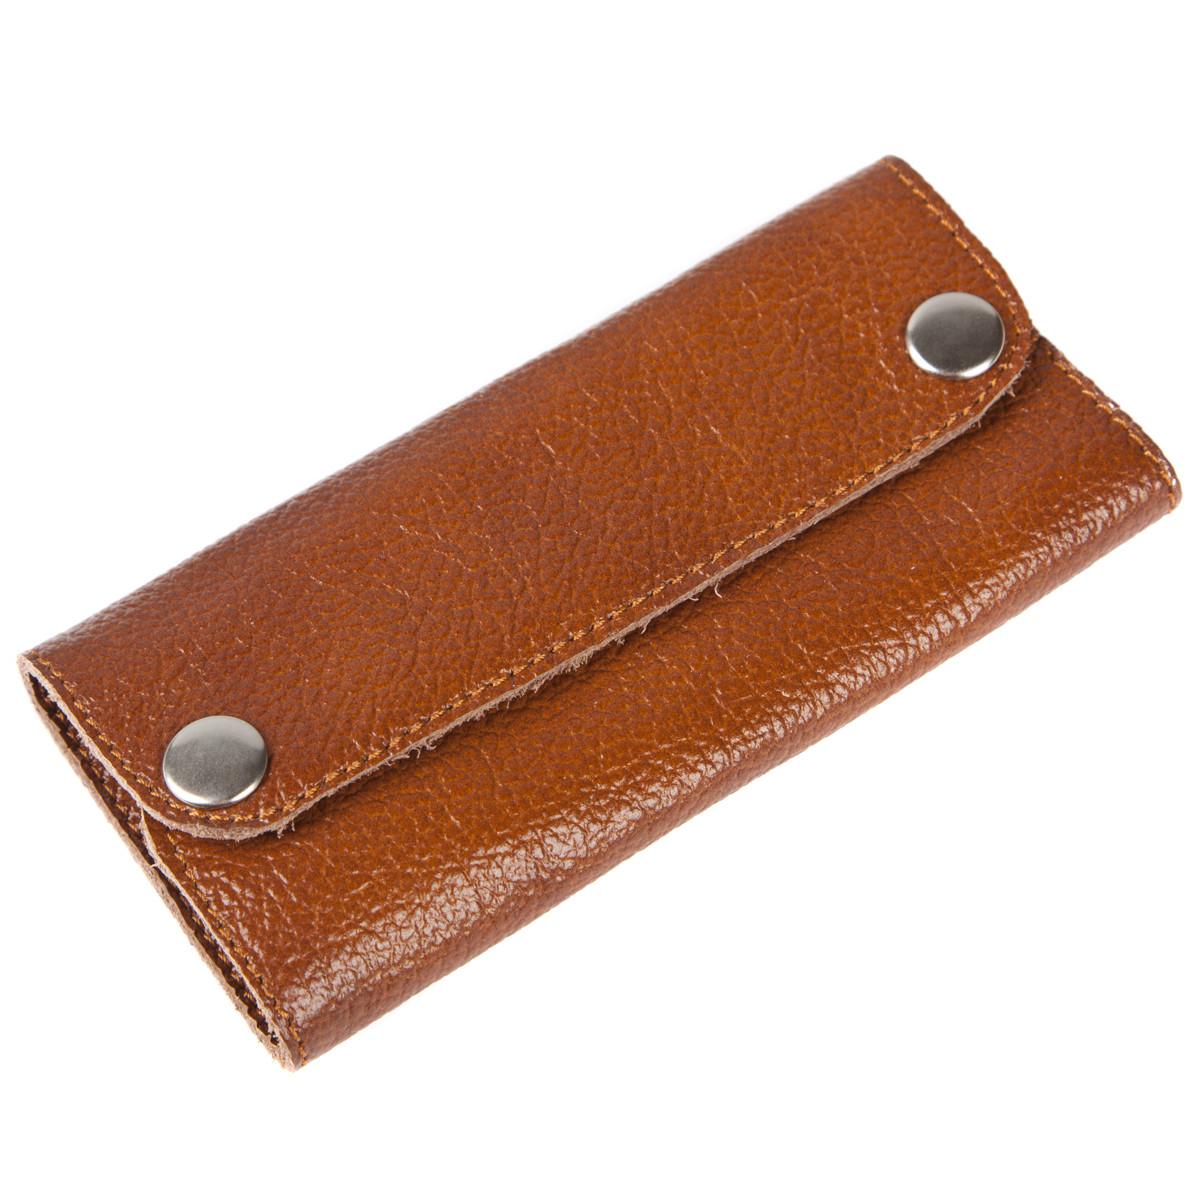 Ключница-портмоне кожанная 13х6,5х2,5 BagHouse на 6 ключей    клКН13кор